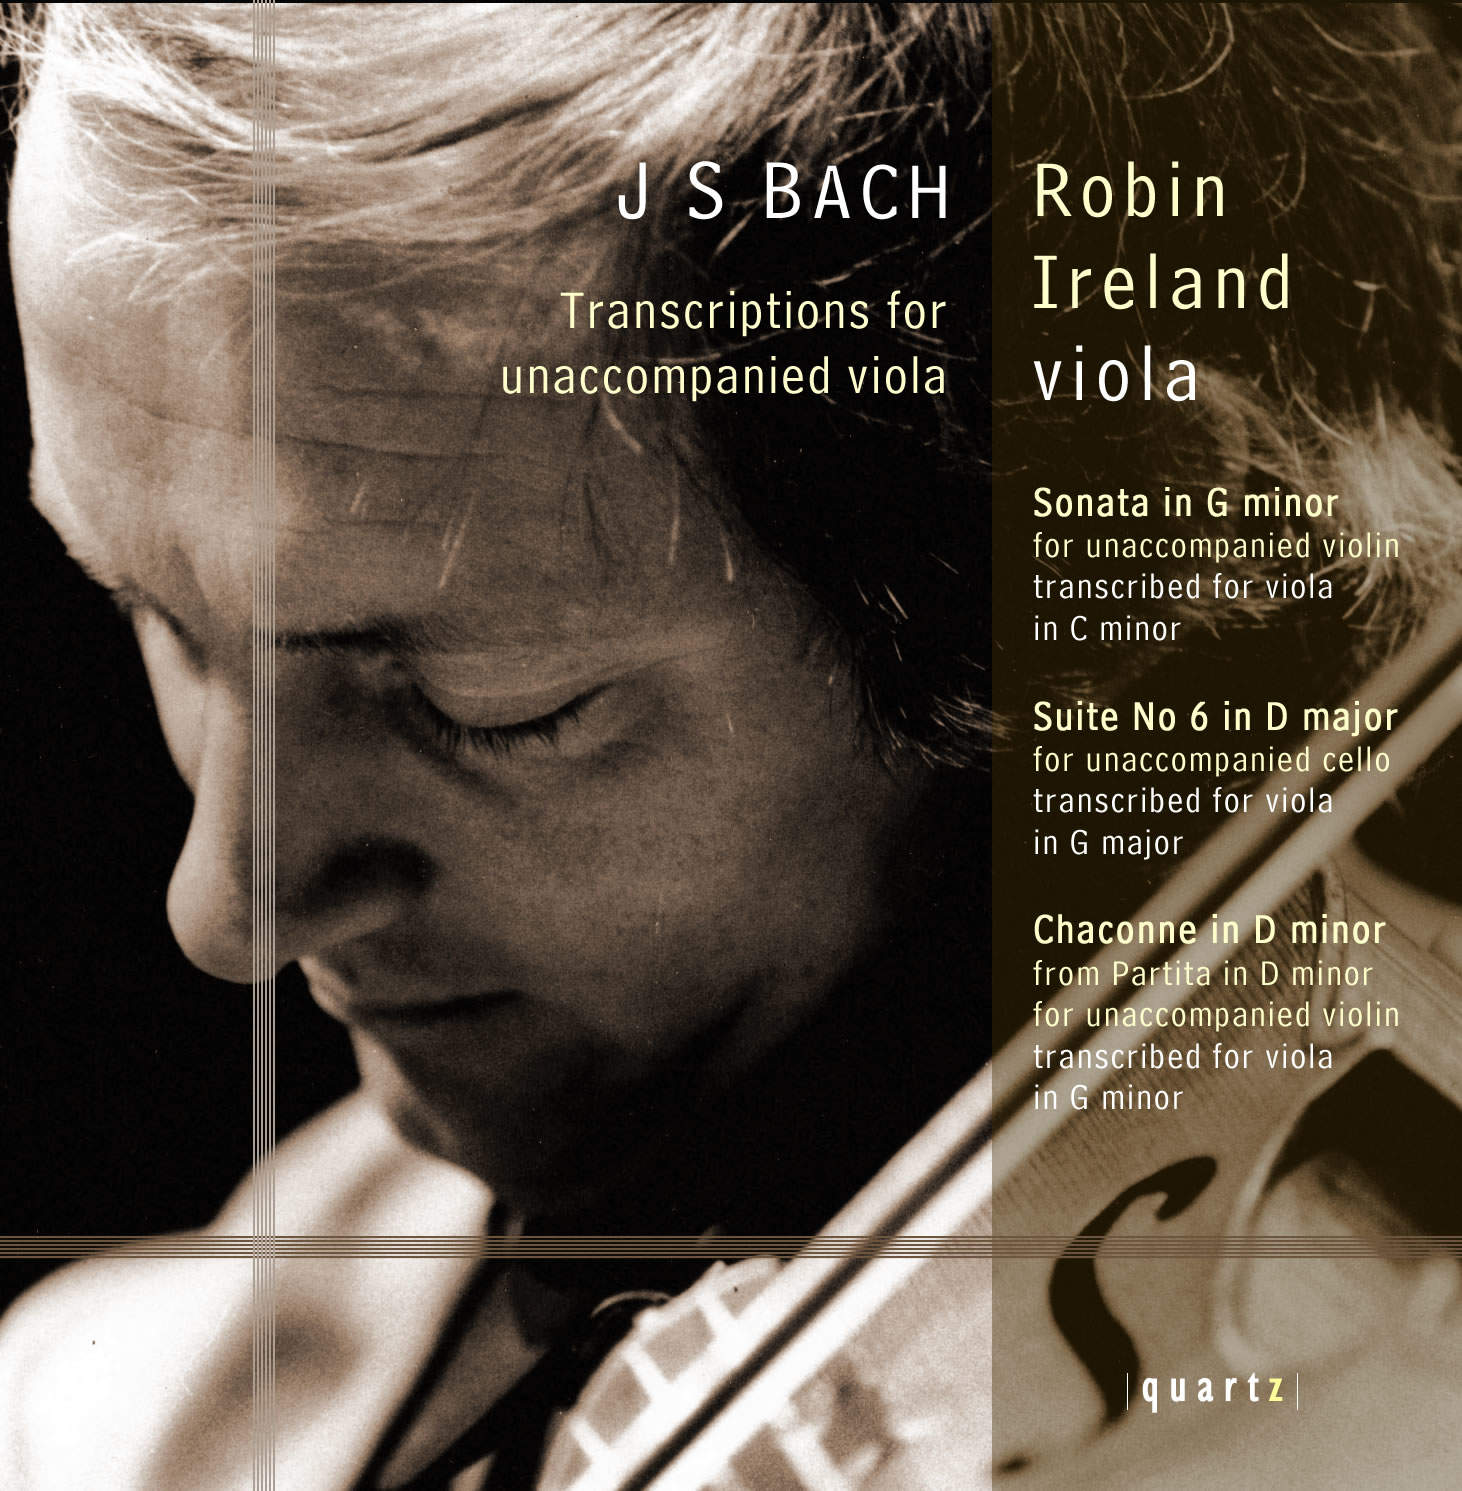 Robin Ireland (viola)